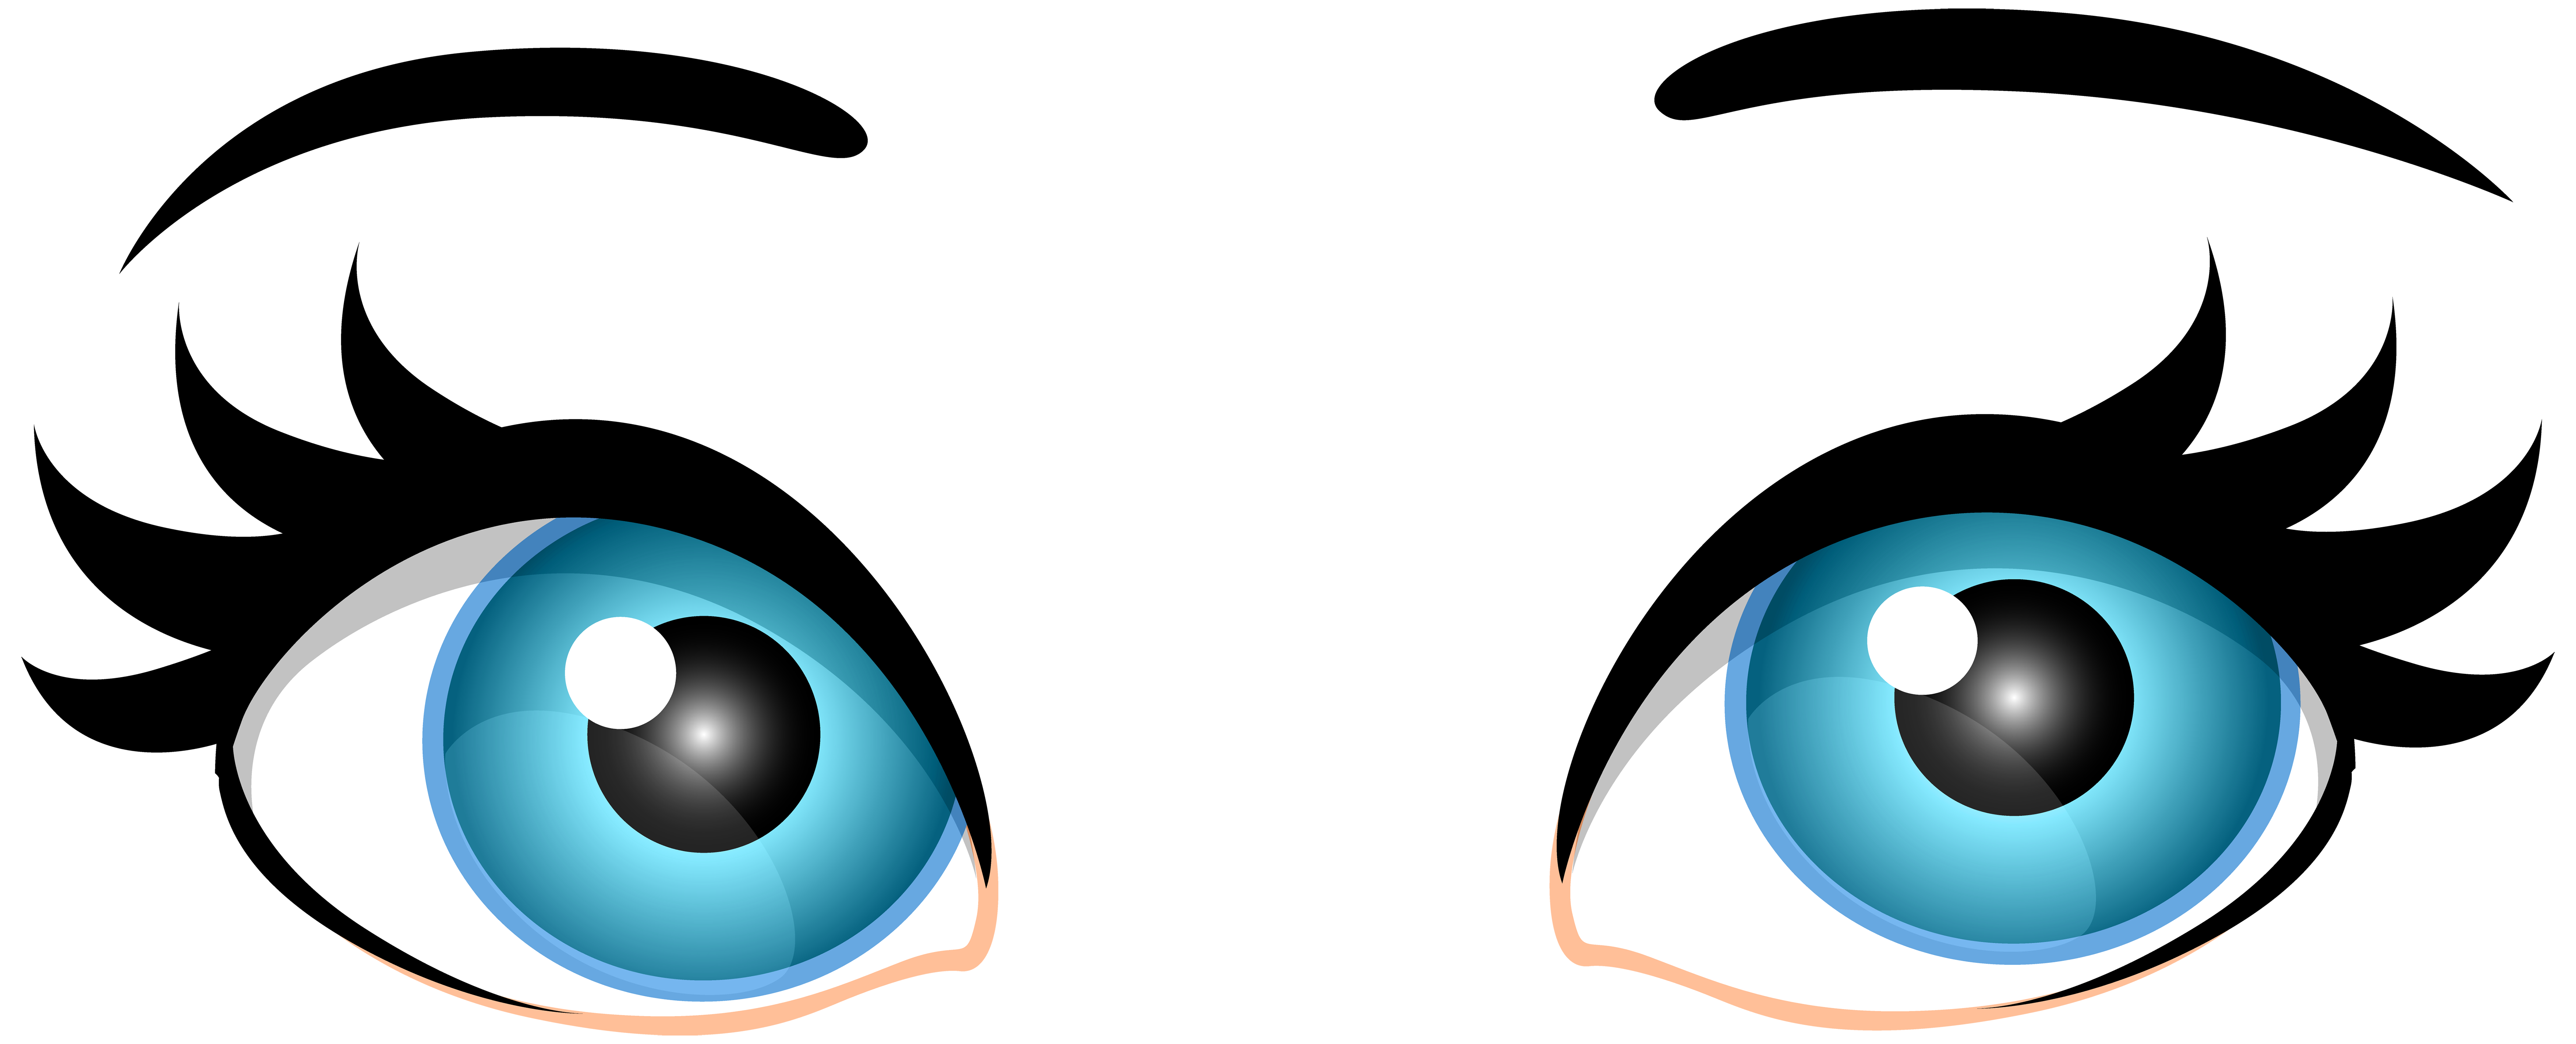 Black circle girl eye clipart graphic royalty free Black round girl eyes clipart PNG and cliparts for Free Download ... graphic royalty free